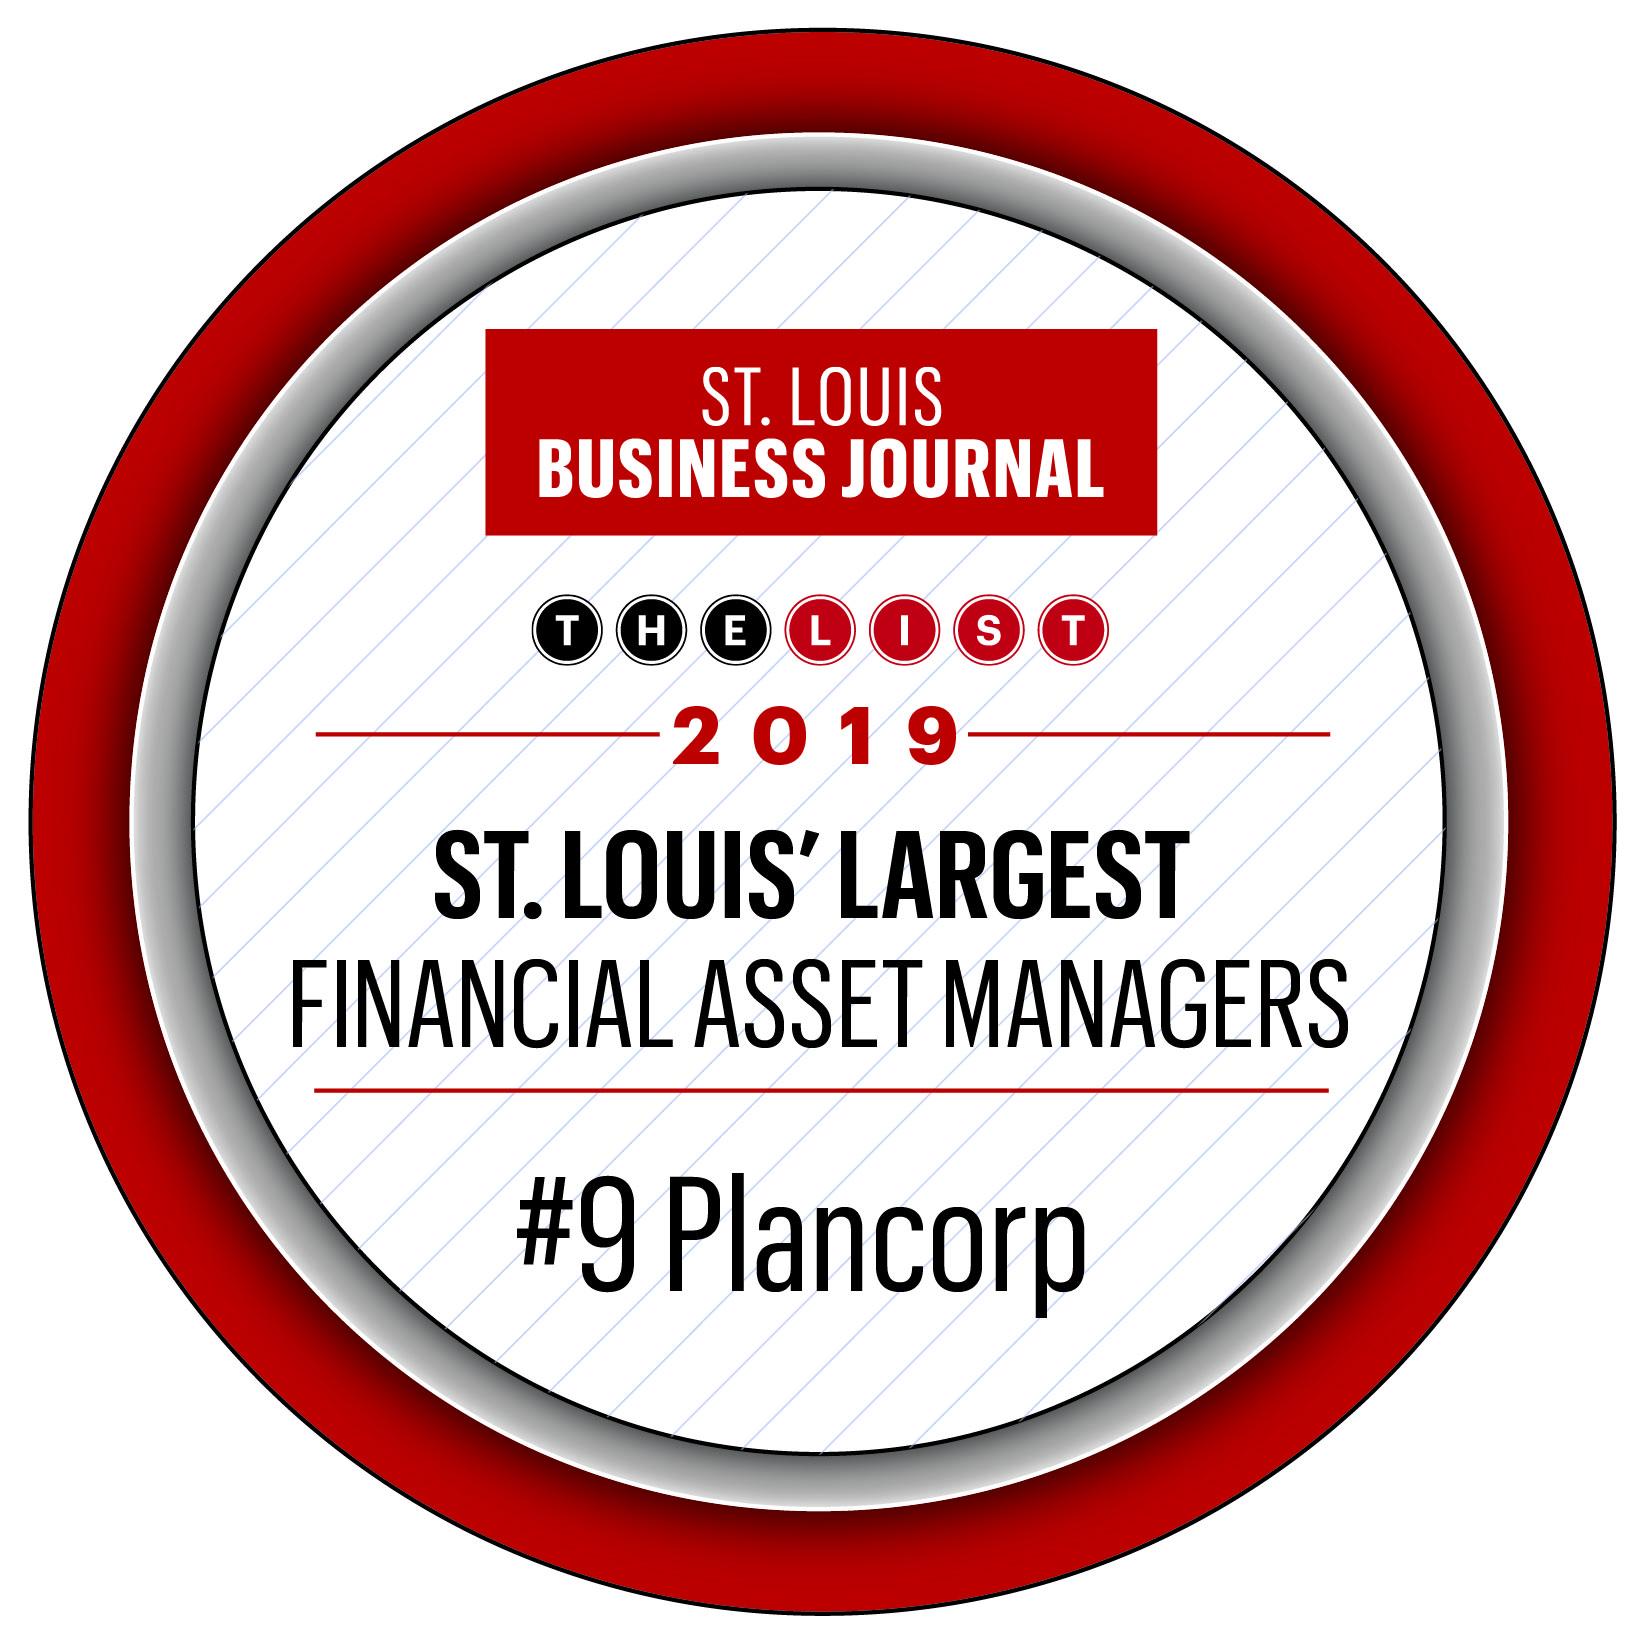 St. Louis' largest financial asset managers